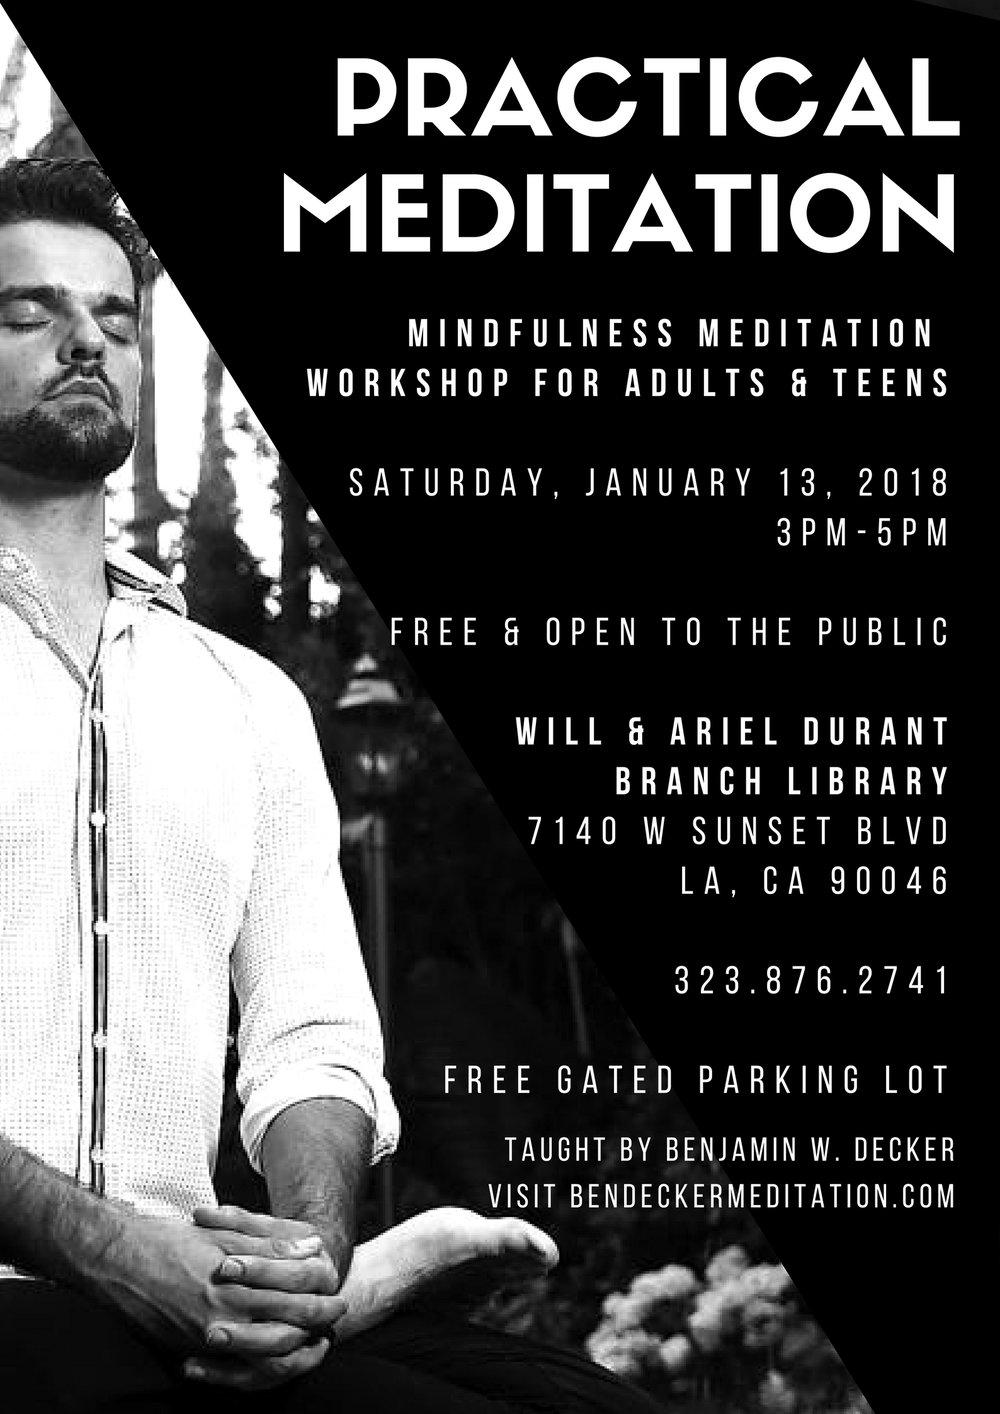 LAPL Practical Meditation Jan 13.jpg